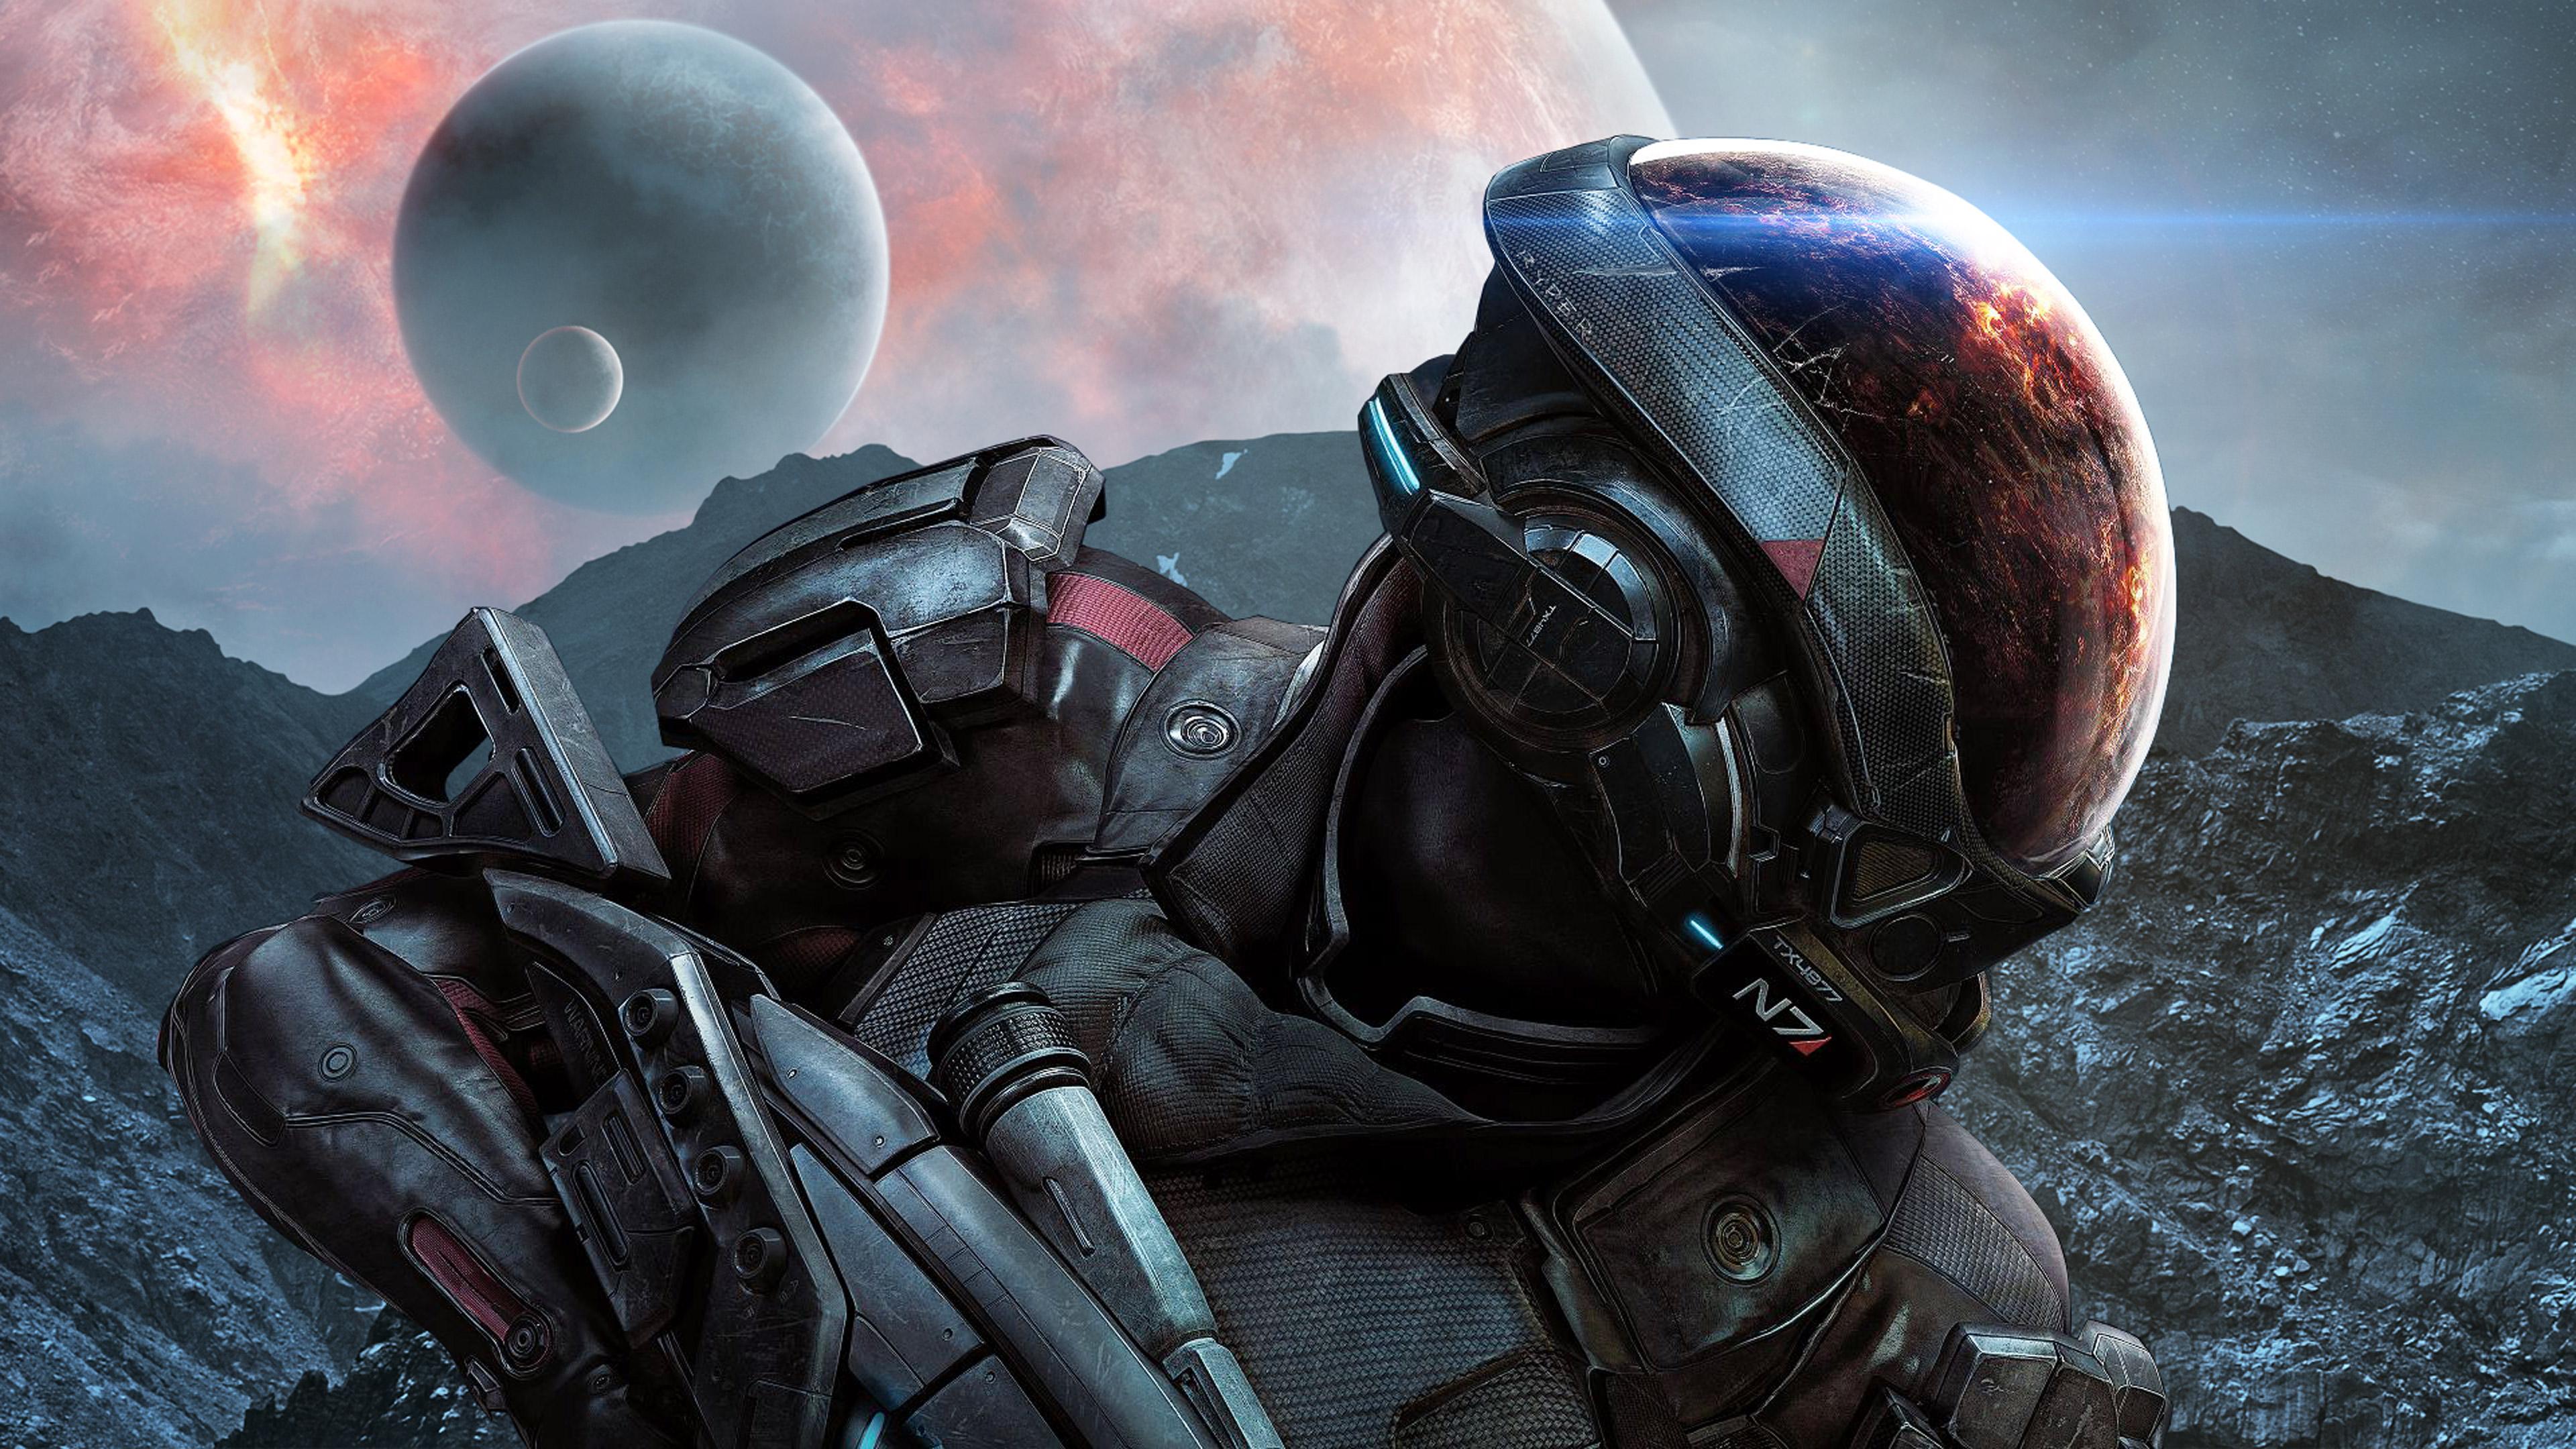 Mass Effect Andromeda Game 4k, HD Games, 4k Wallpapers